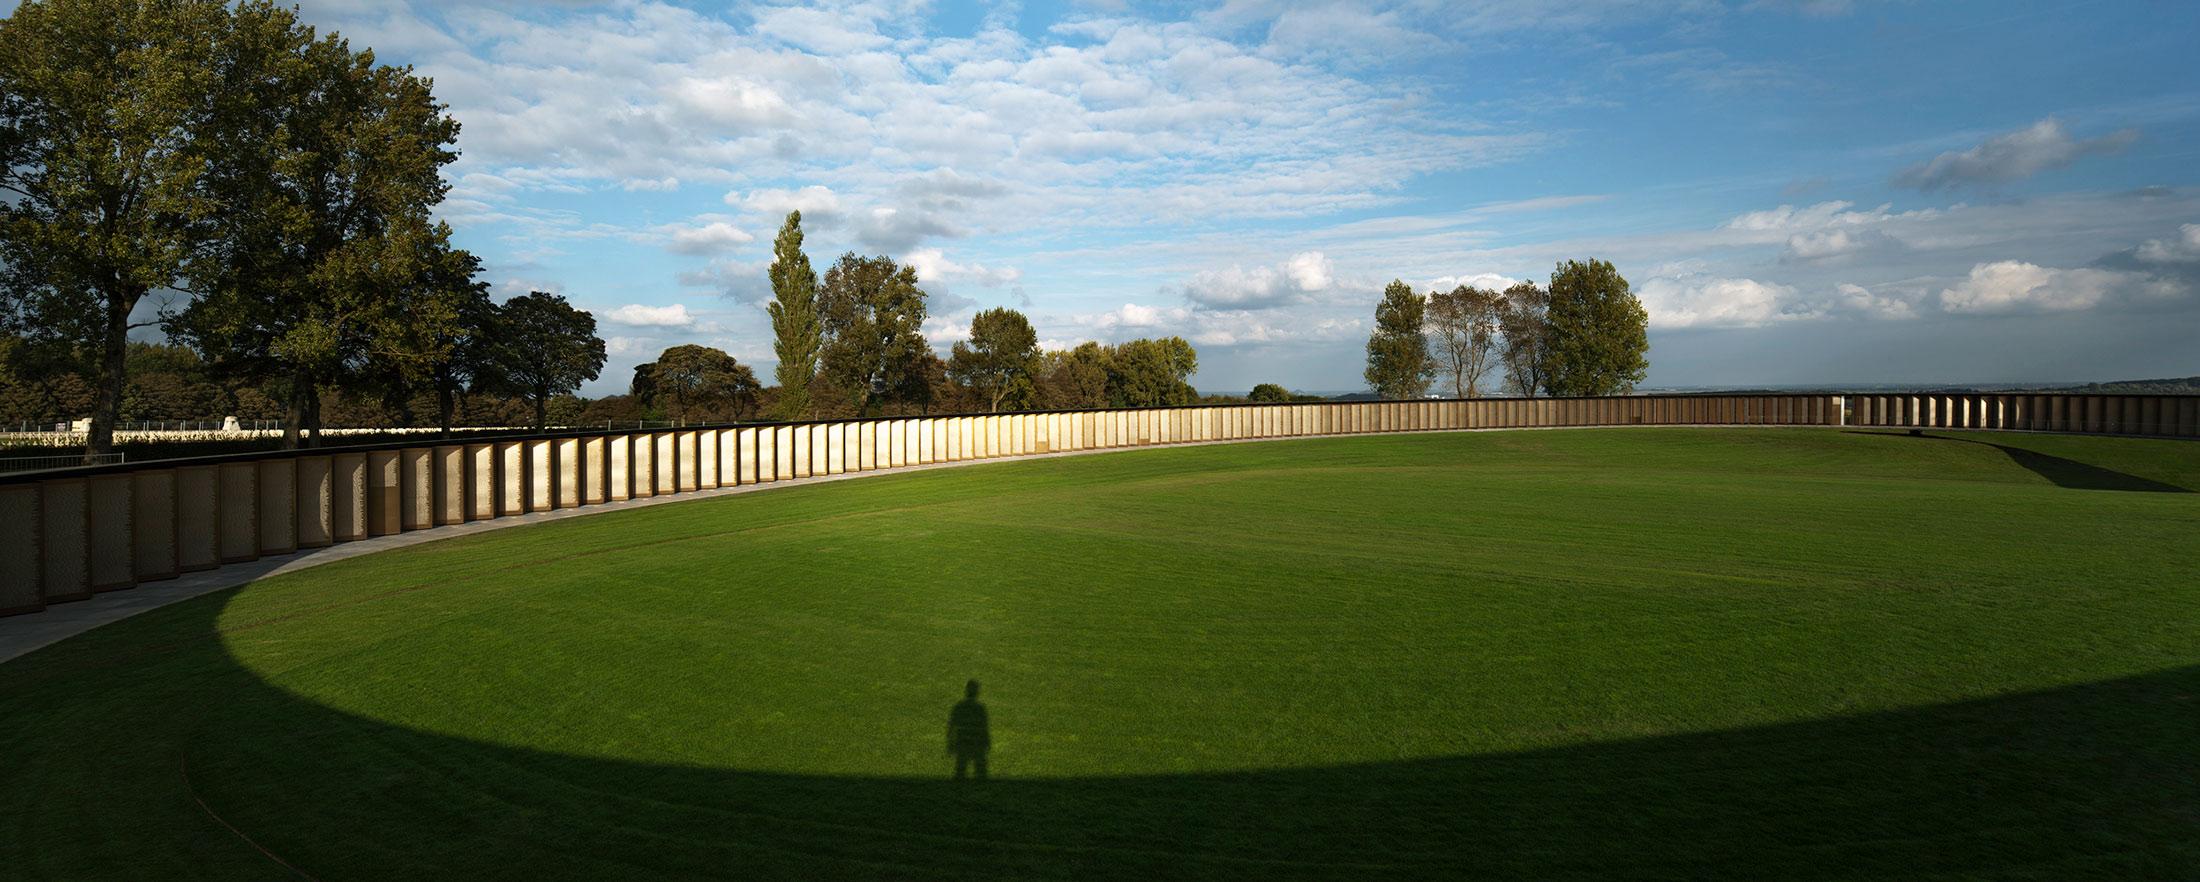 Ring of Remembrance, International WWI Memorial of Notre-Dame-de-Lorette